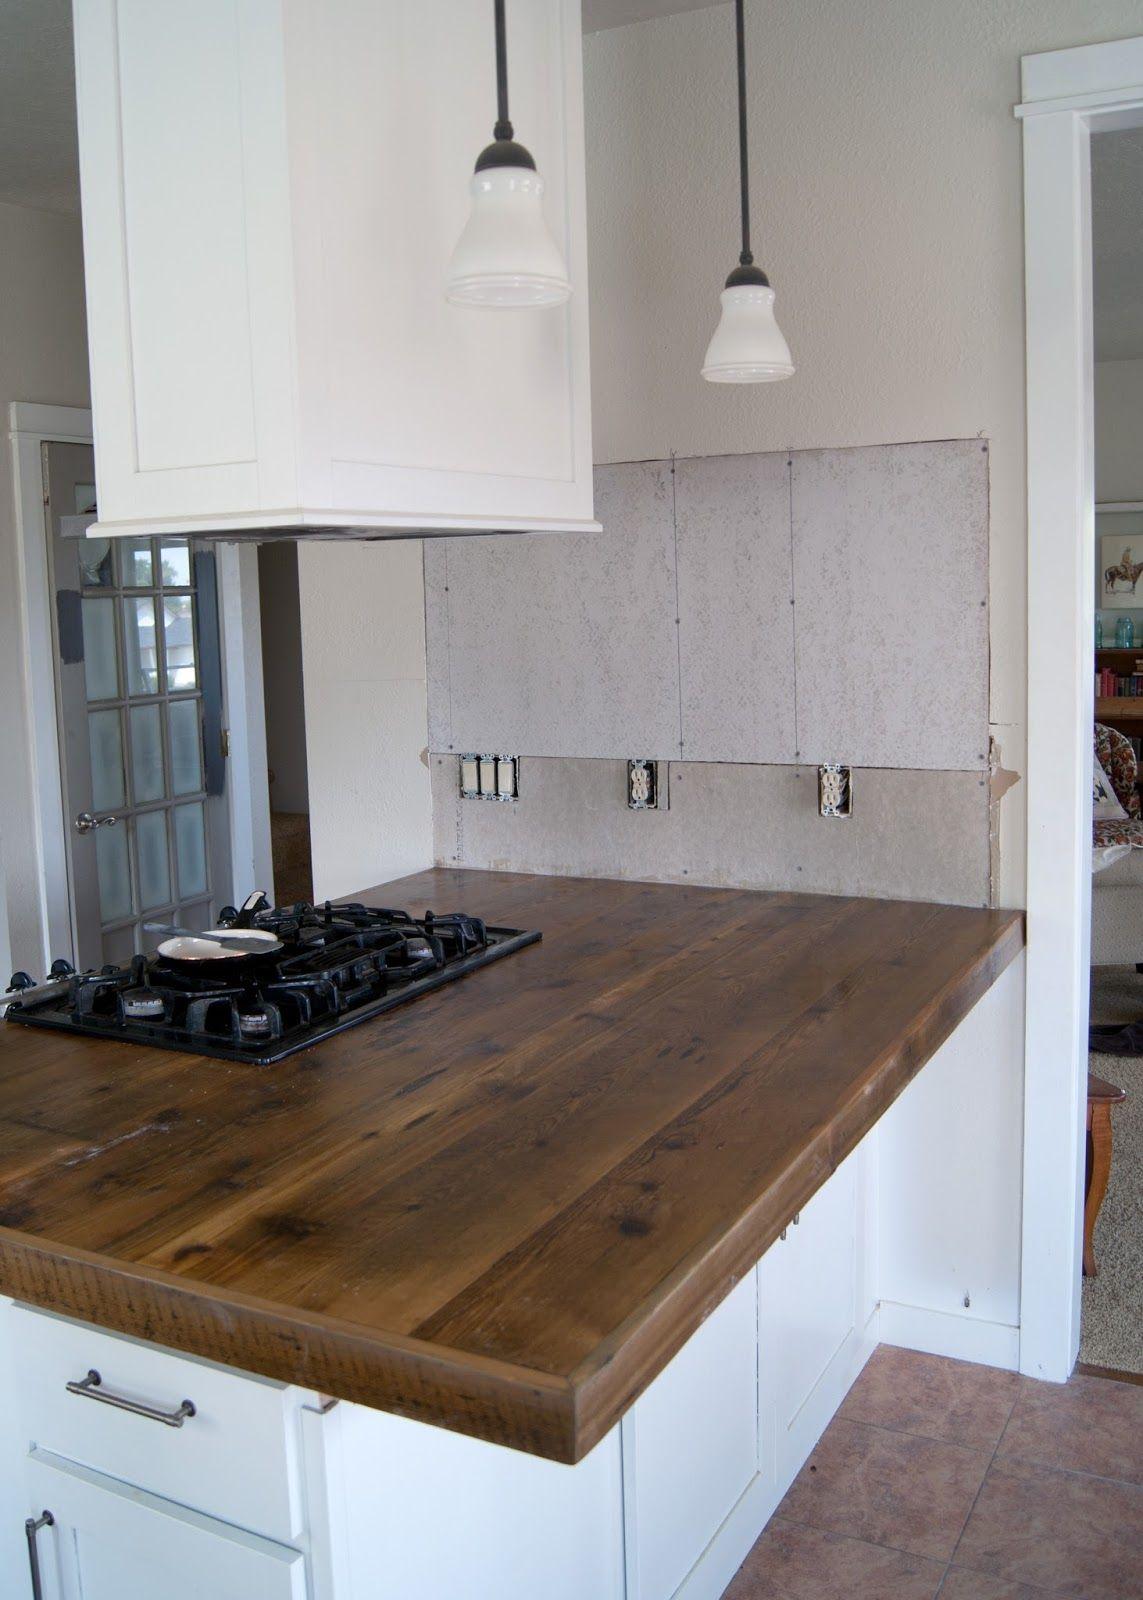 DIY Reclaimed Wood Countertop Countertops, I am and